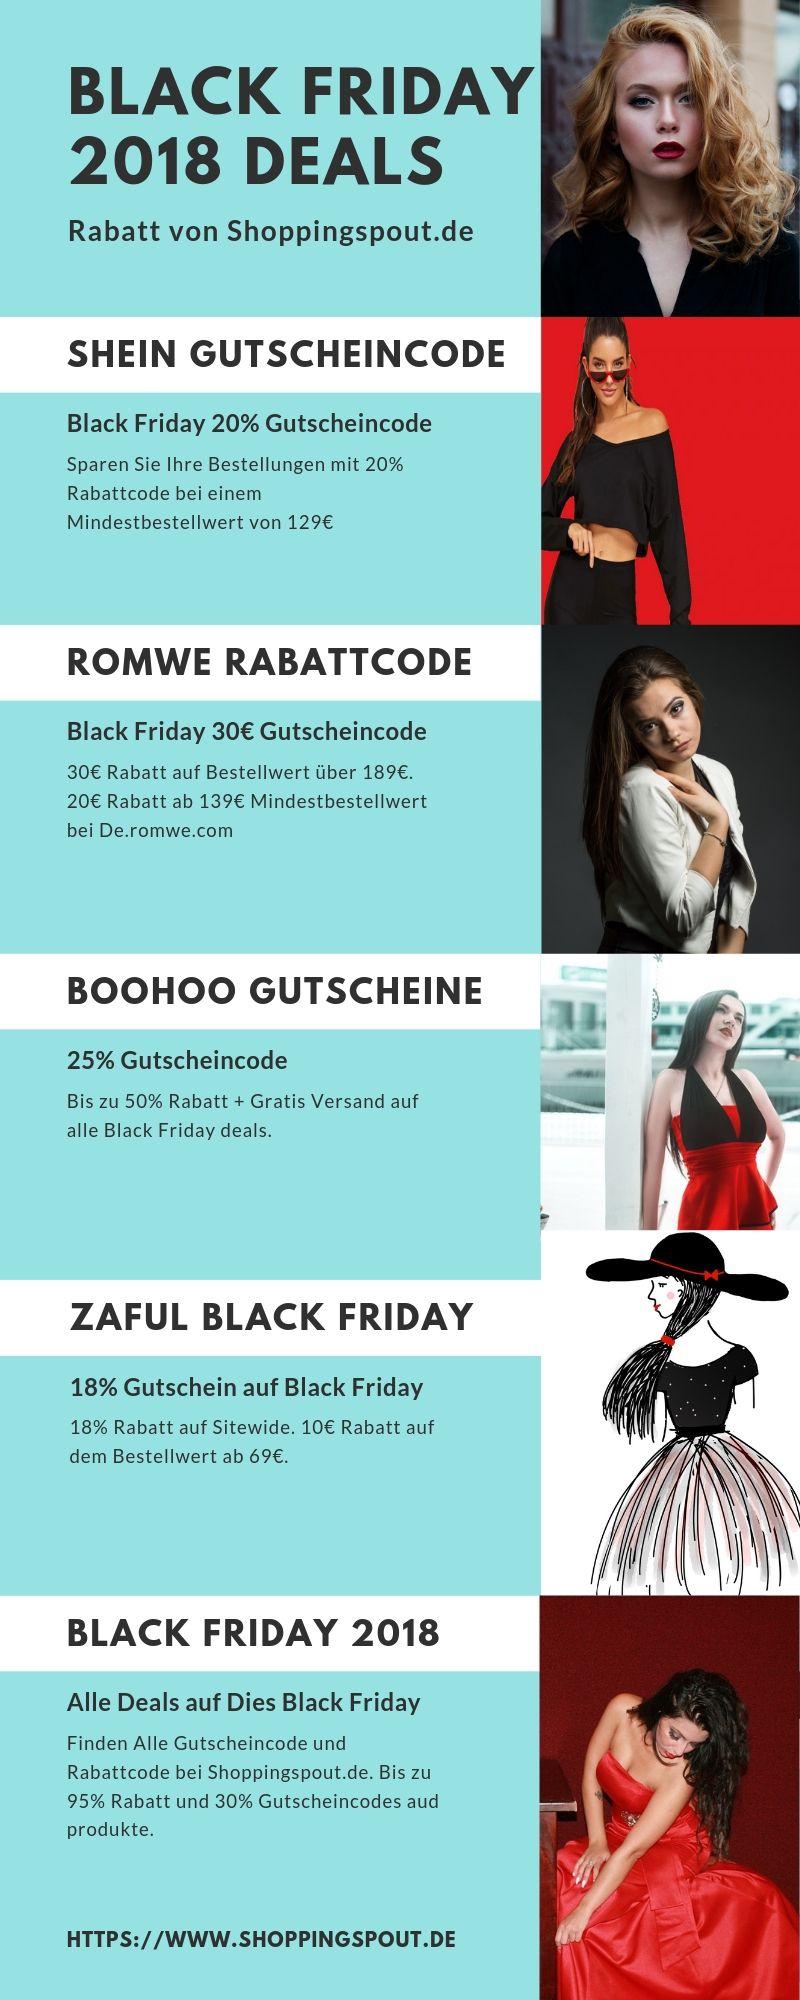 Top Black Friday 2018 Rabattcode Und Deals Bei Shoppingspout De